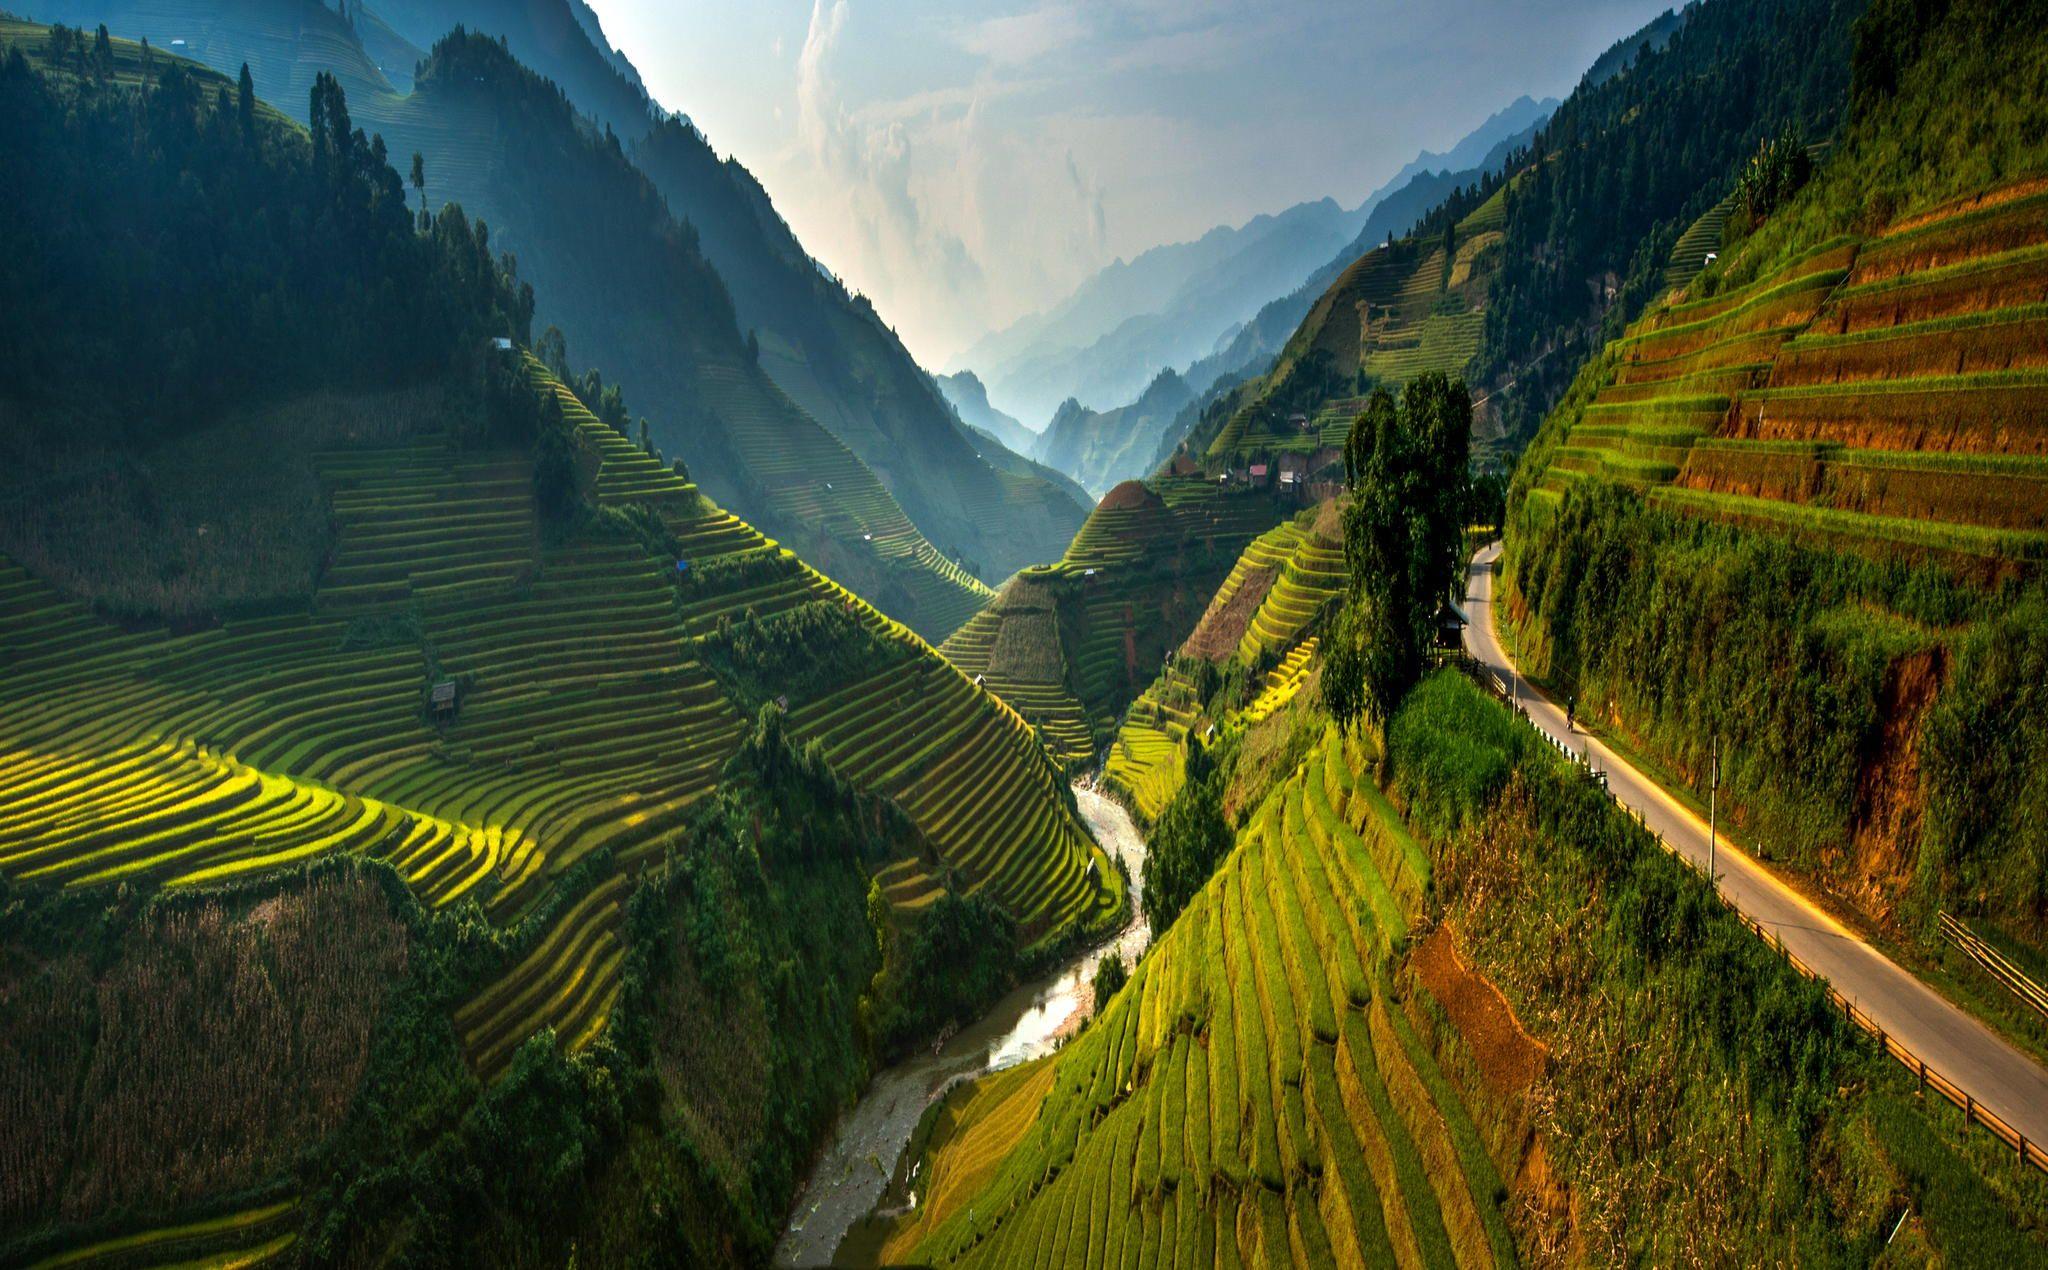 mountainous area in Dian Bien province